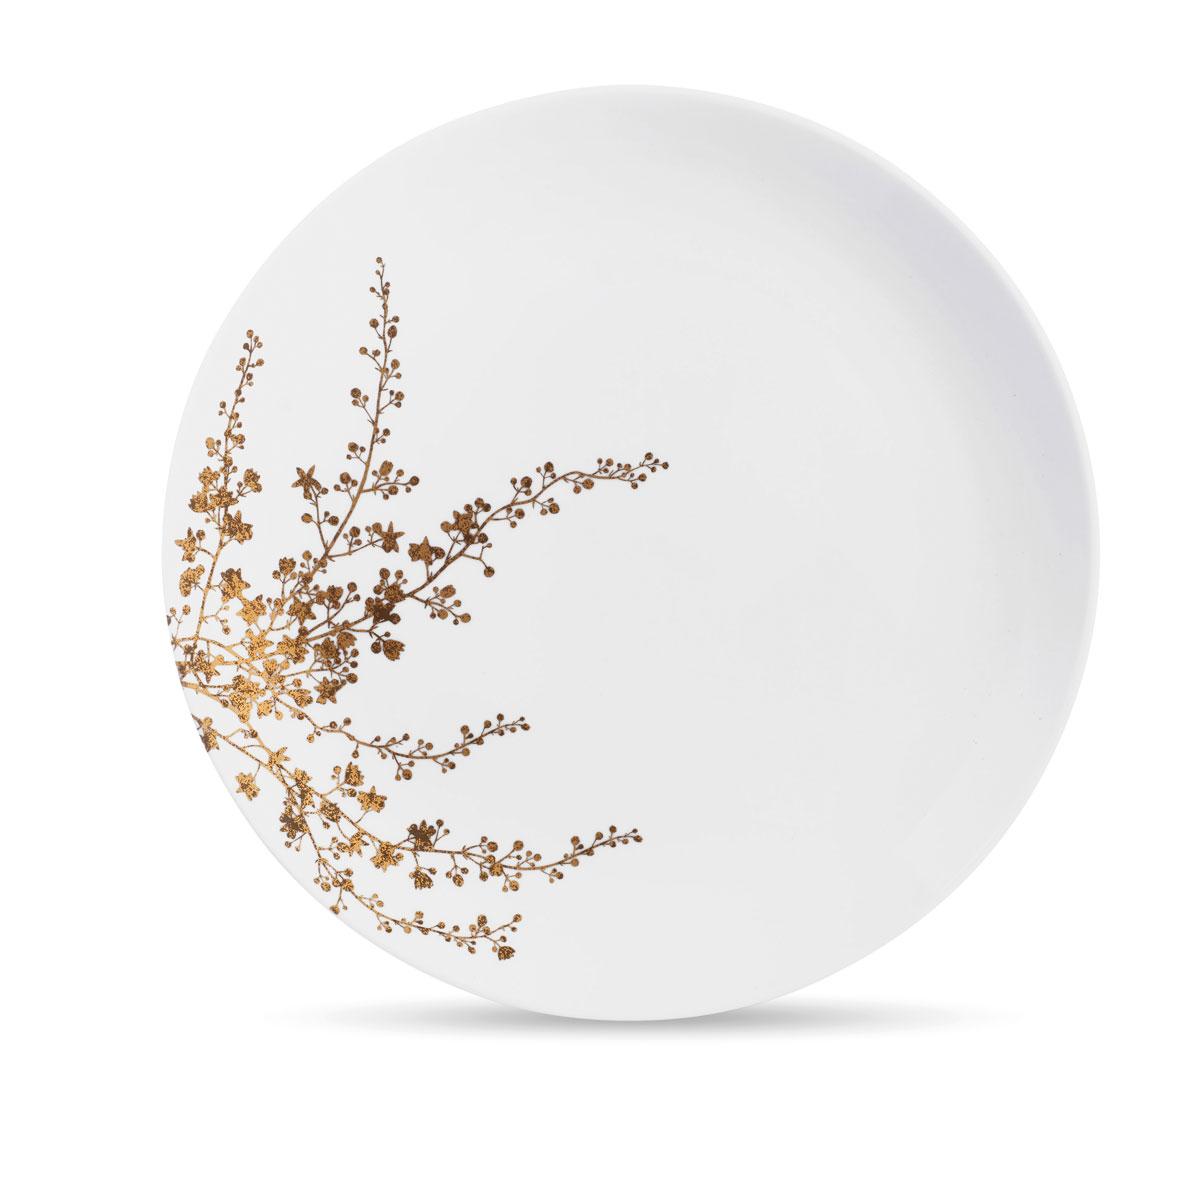 Vera Wang Wedgwood Jardin Dinner Plate, Single